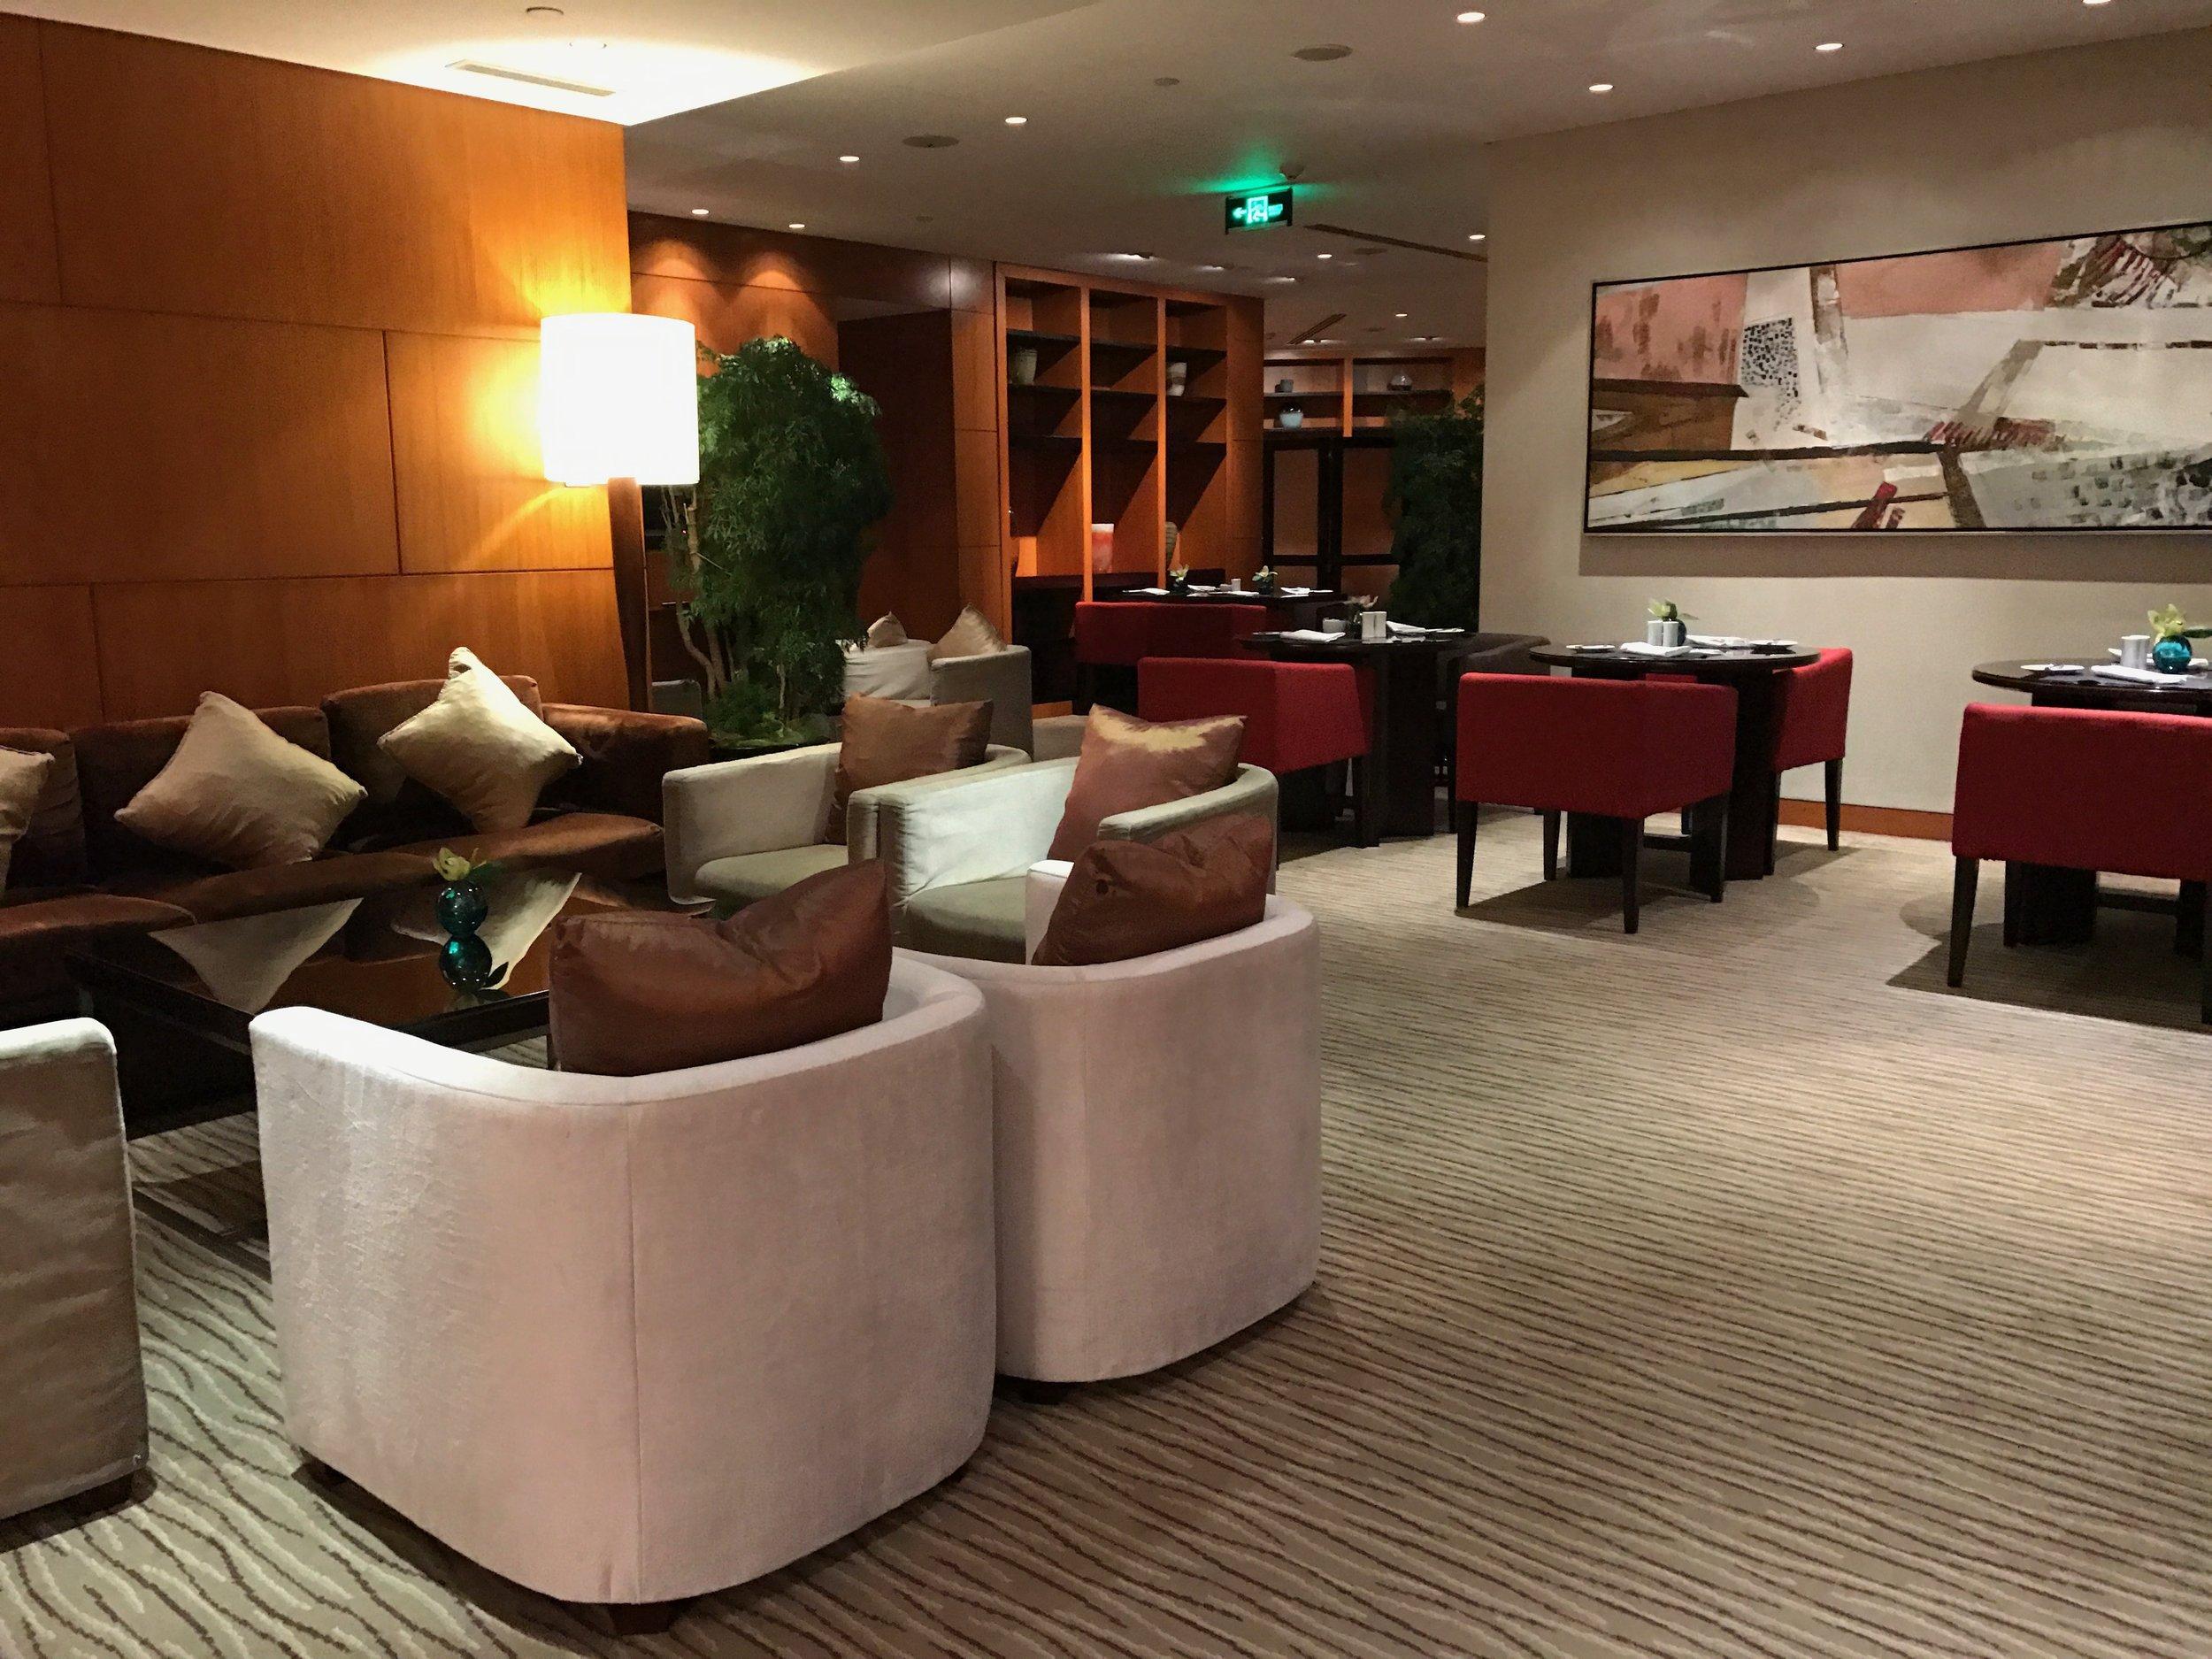 81 - Westin Beijing Financial Street club lounge.jpg